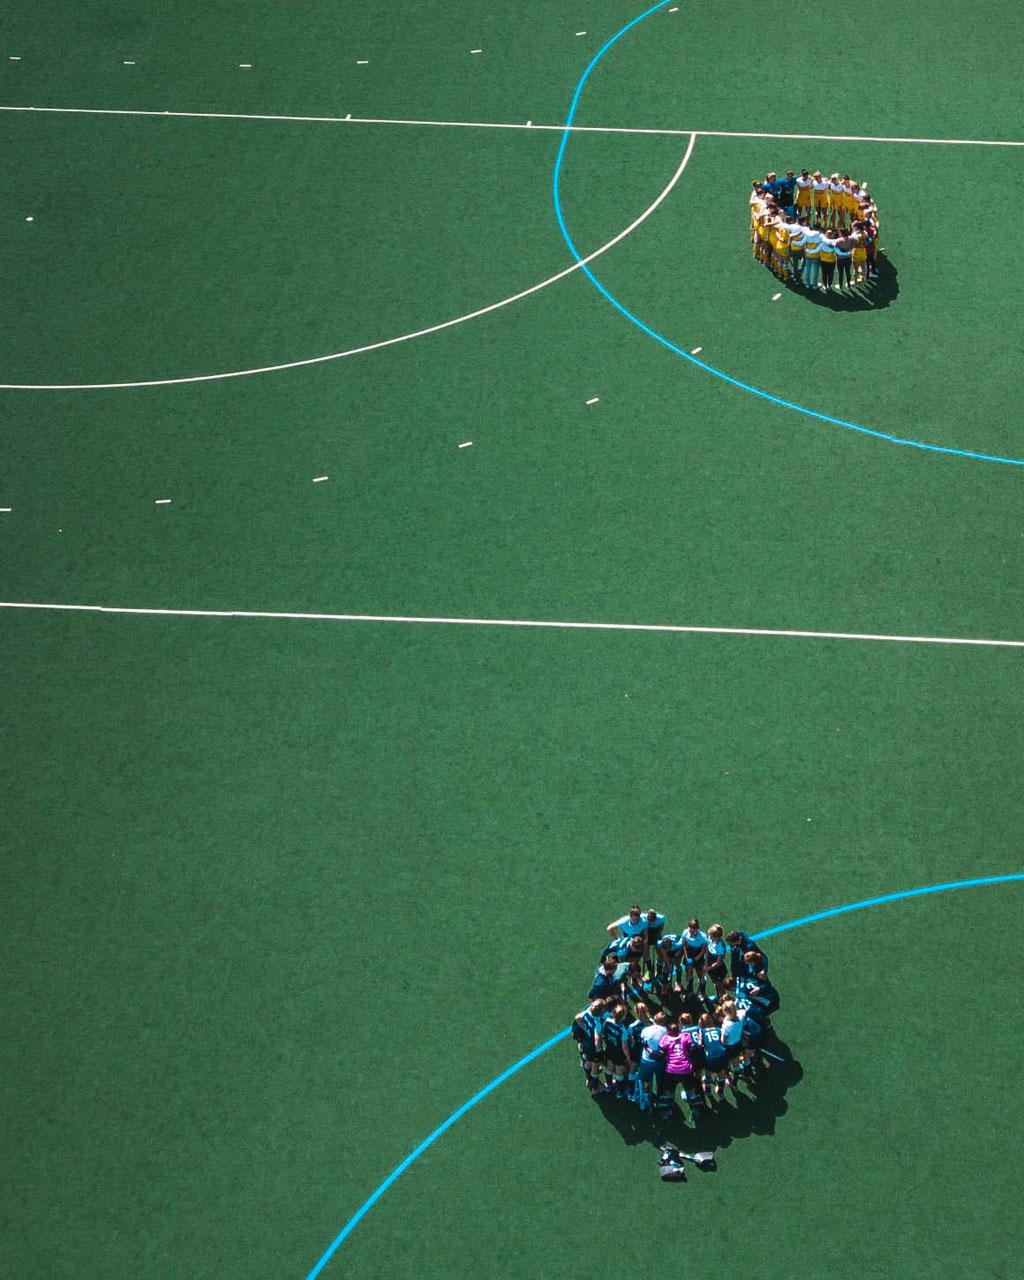 Luftbild Hockeyspiel